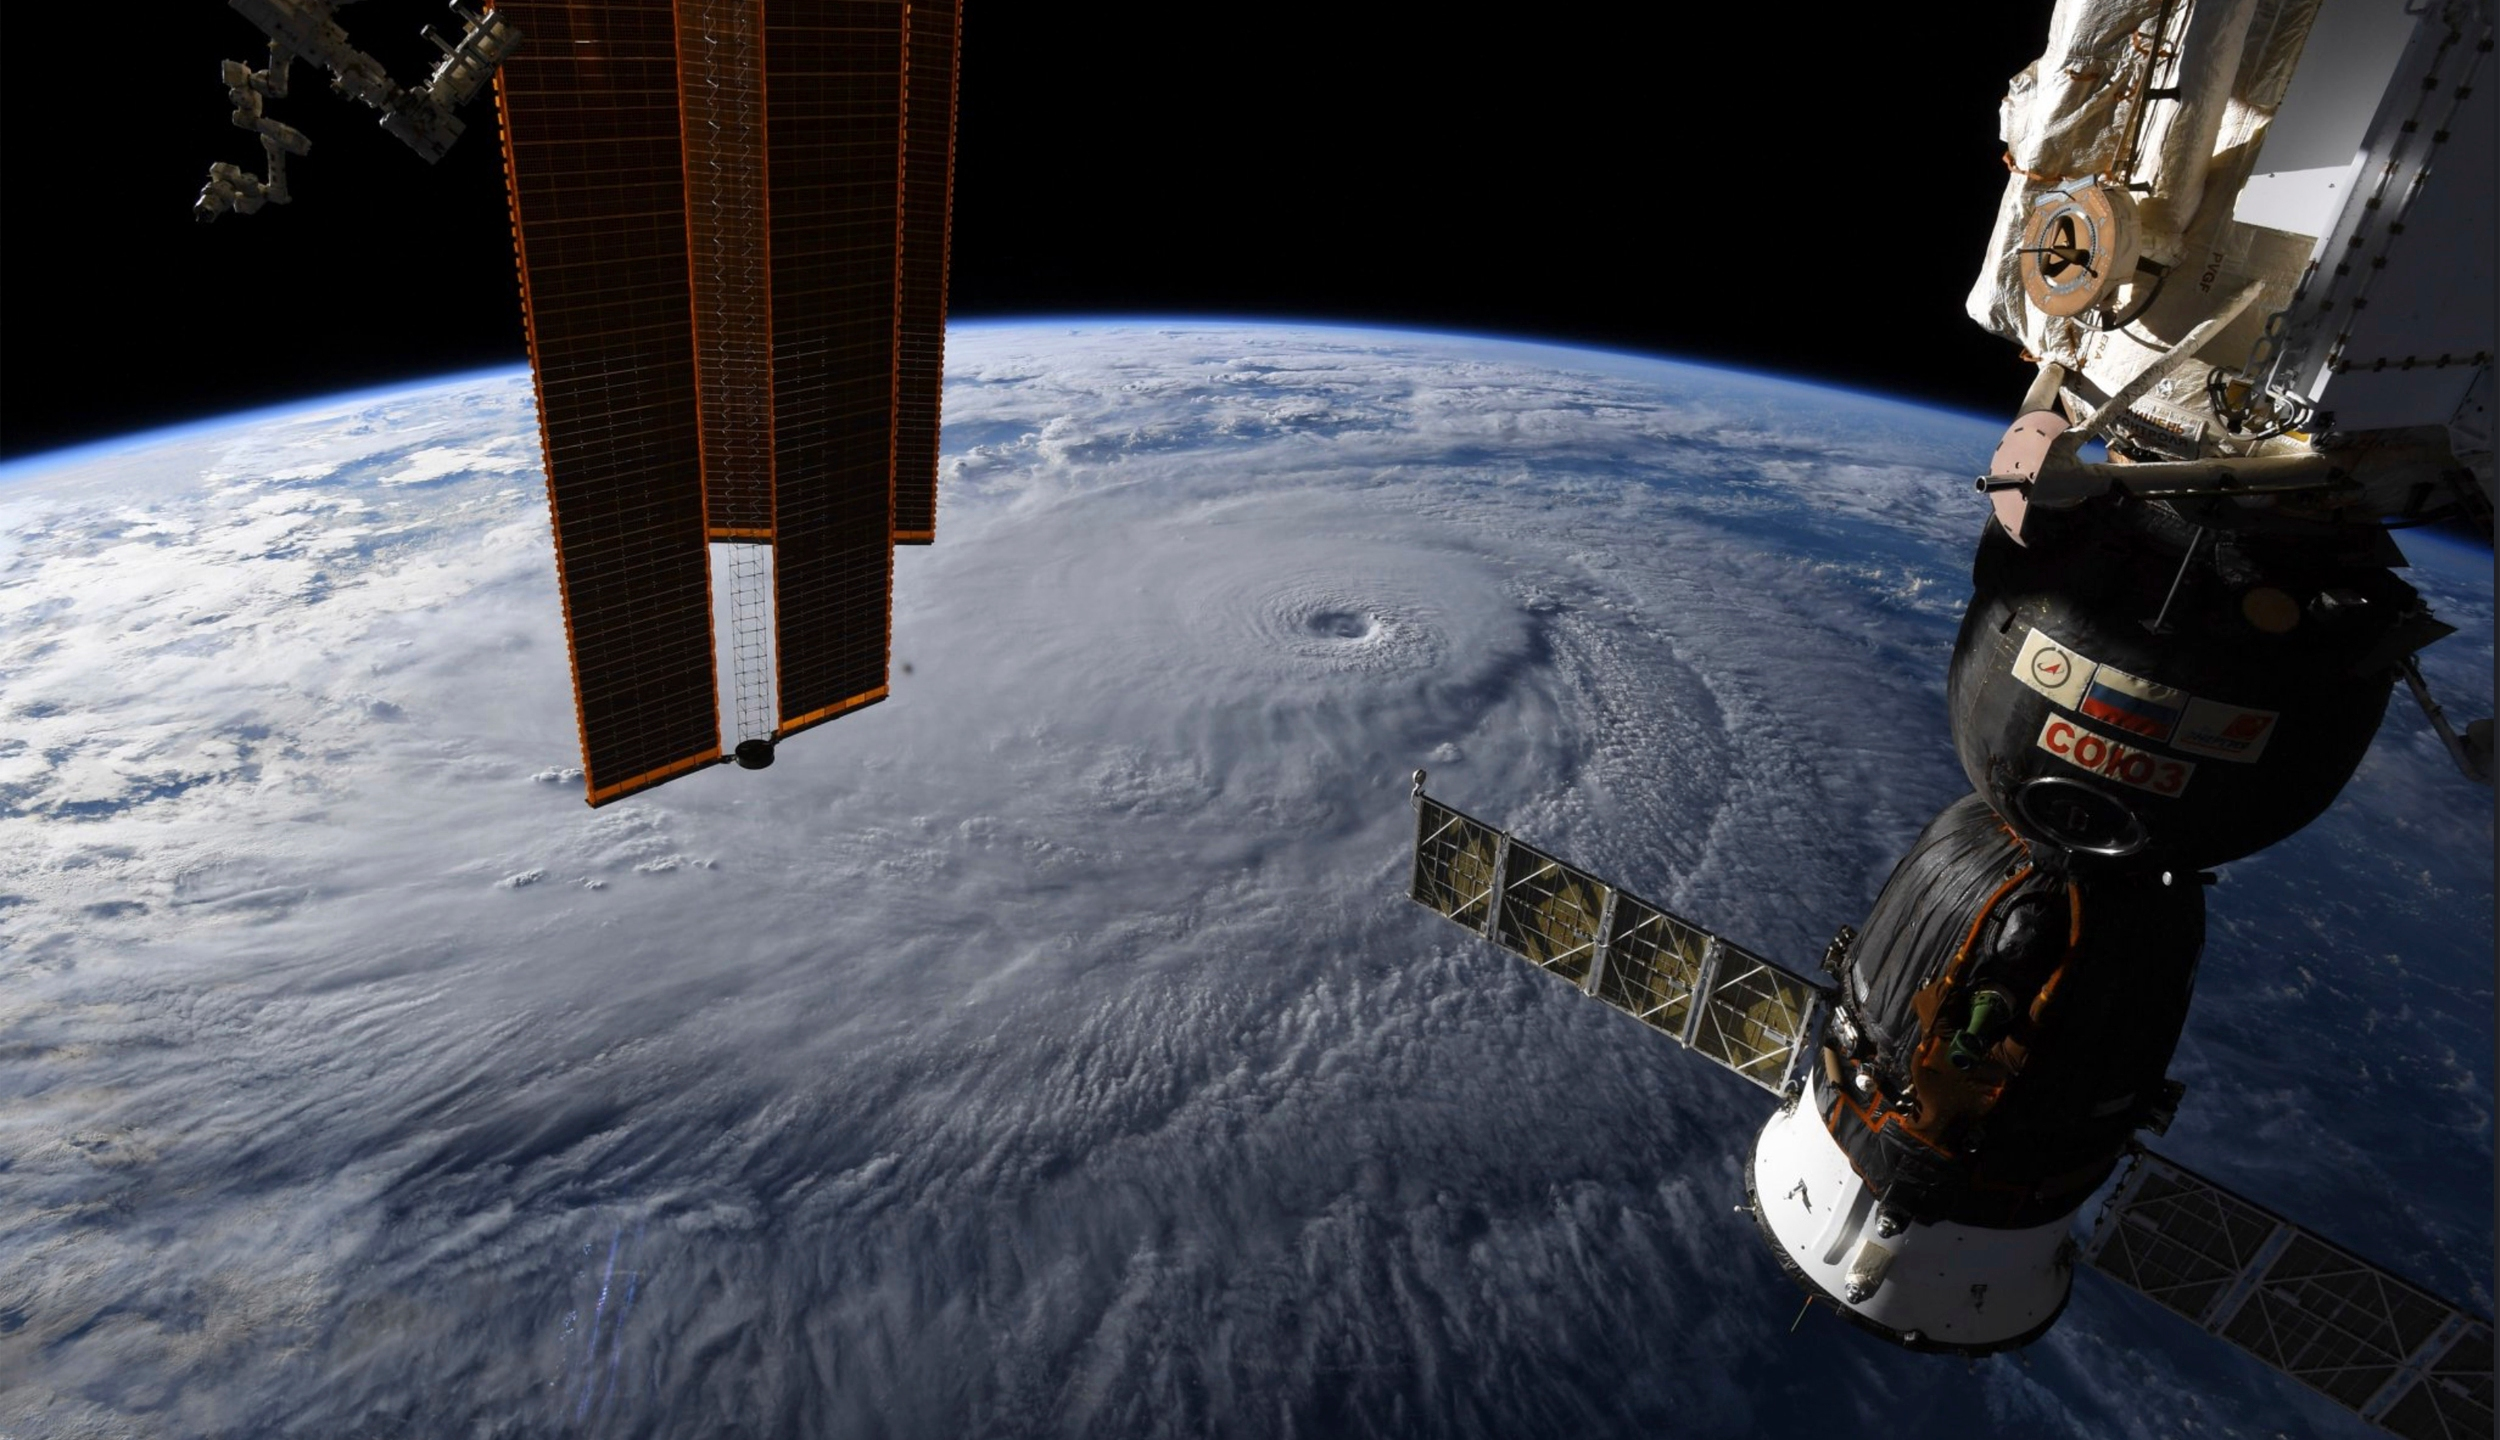 Hurricane_Lane_Hawaii_43227-159532-159532.jpg31864329